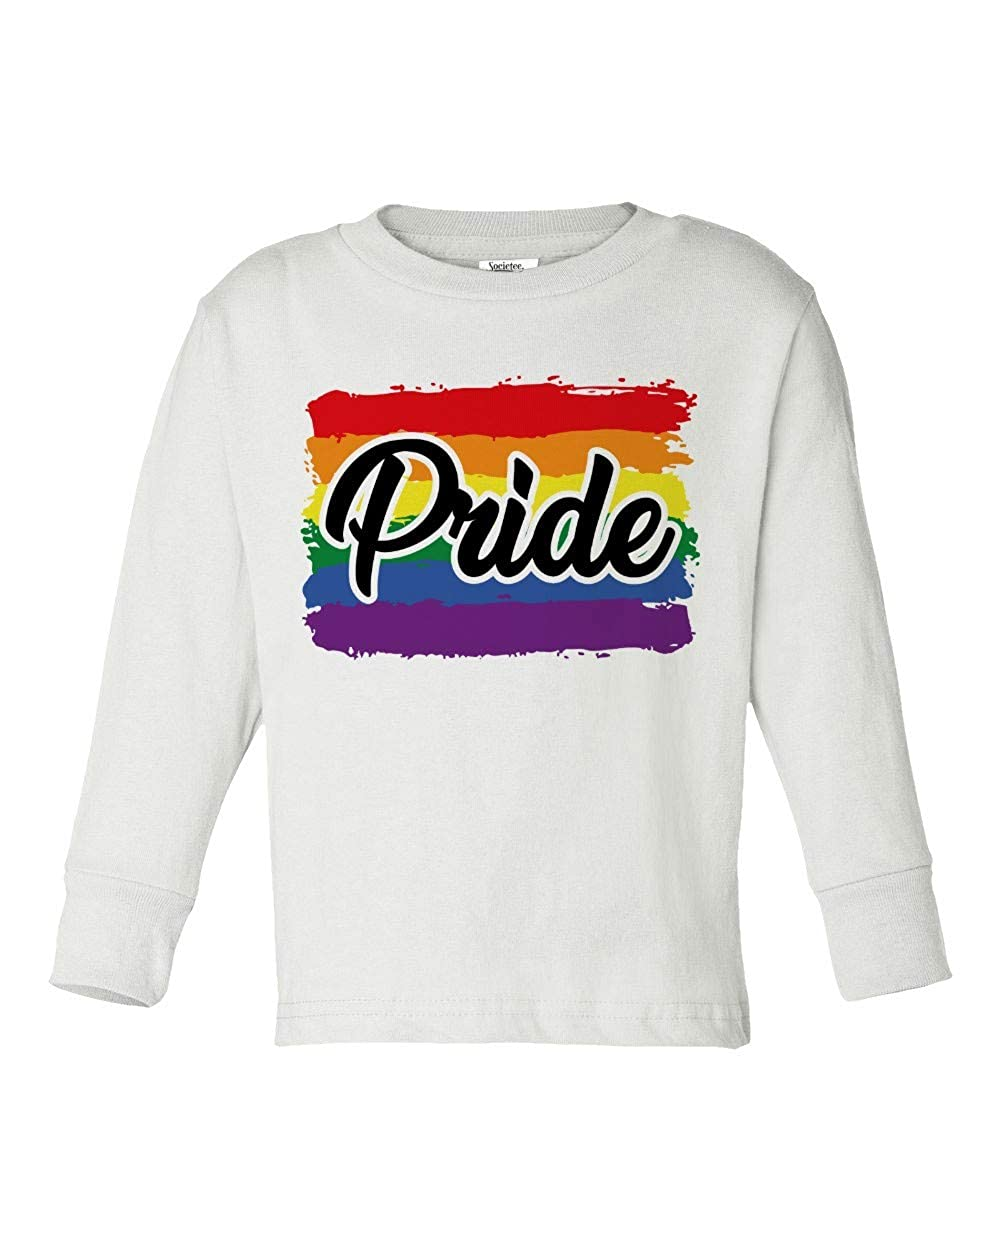 Societee Rainbow Gay Pride Cute Girls Boys Toddler Long Sleeve T-Shirt